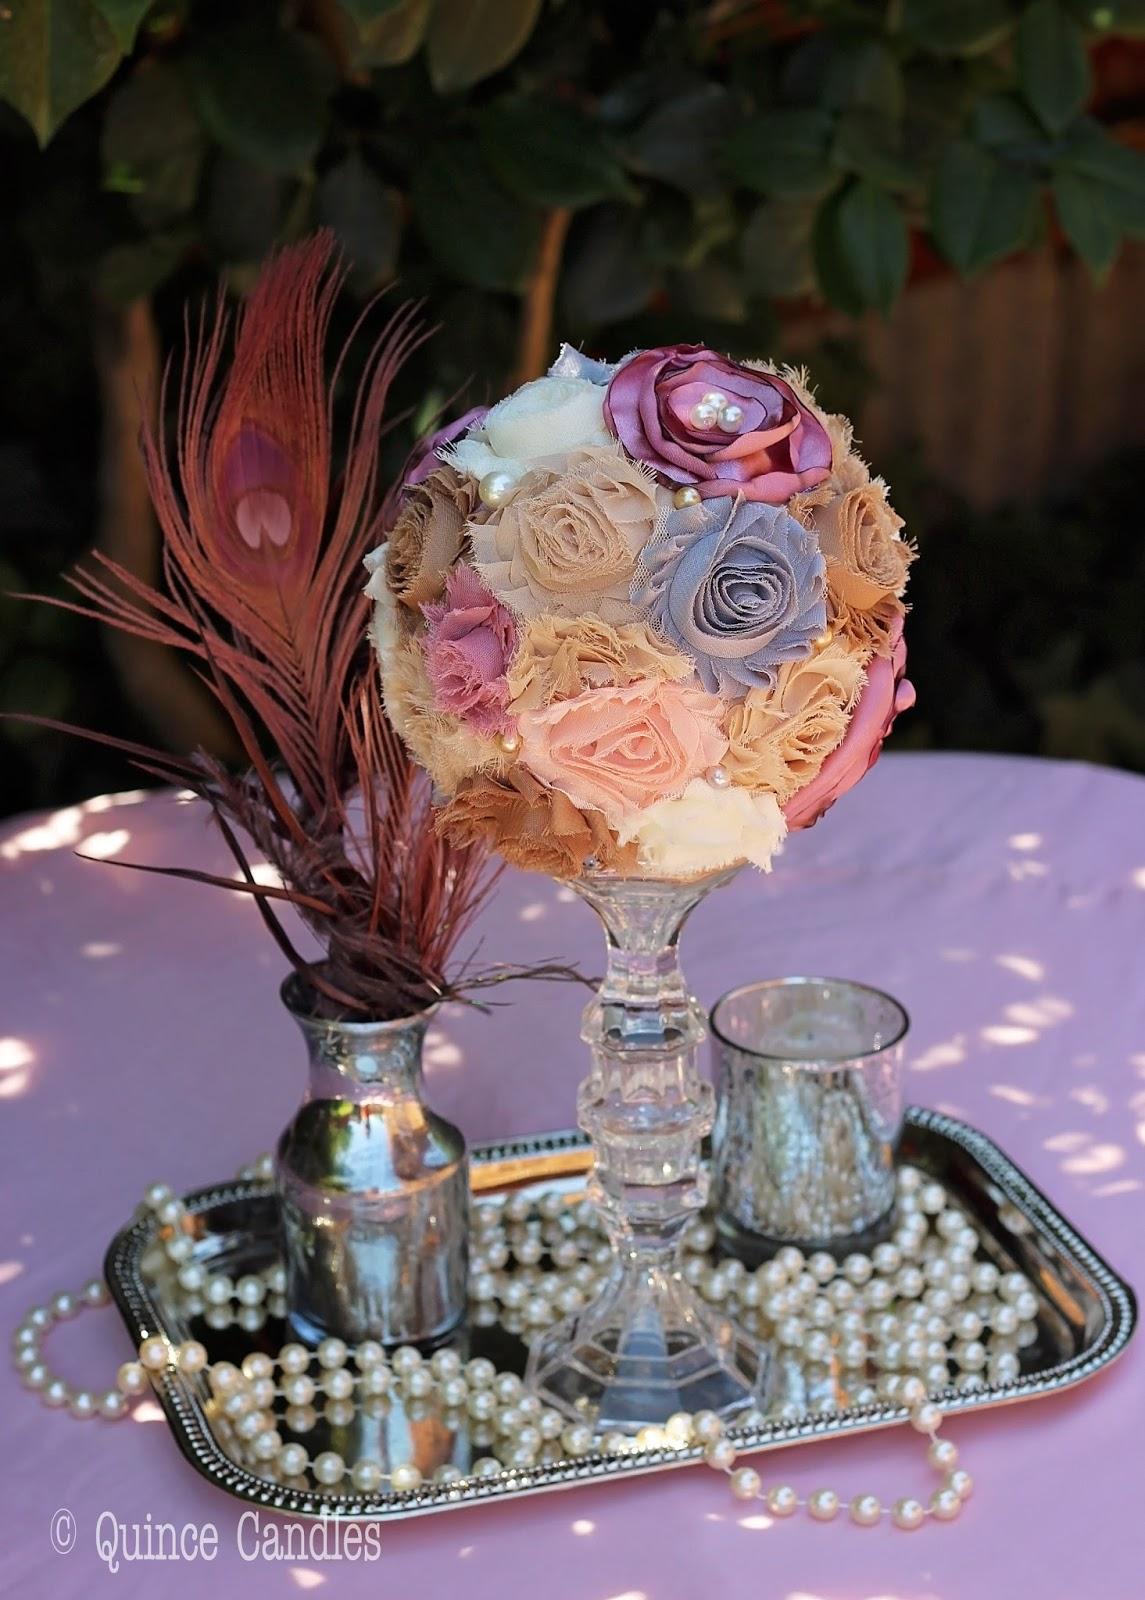 Diy fabric flower topiary centerpiece idea inspiration